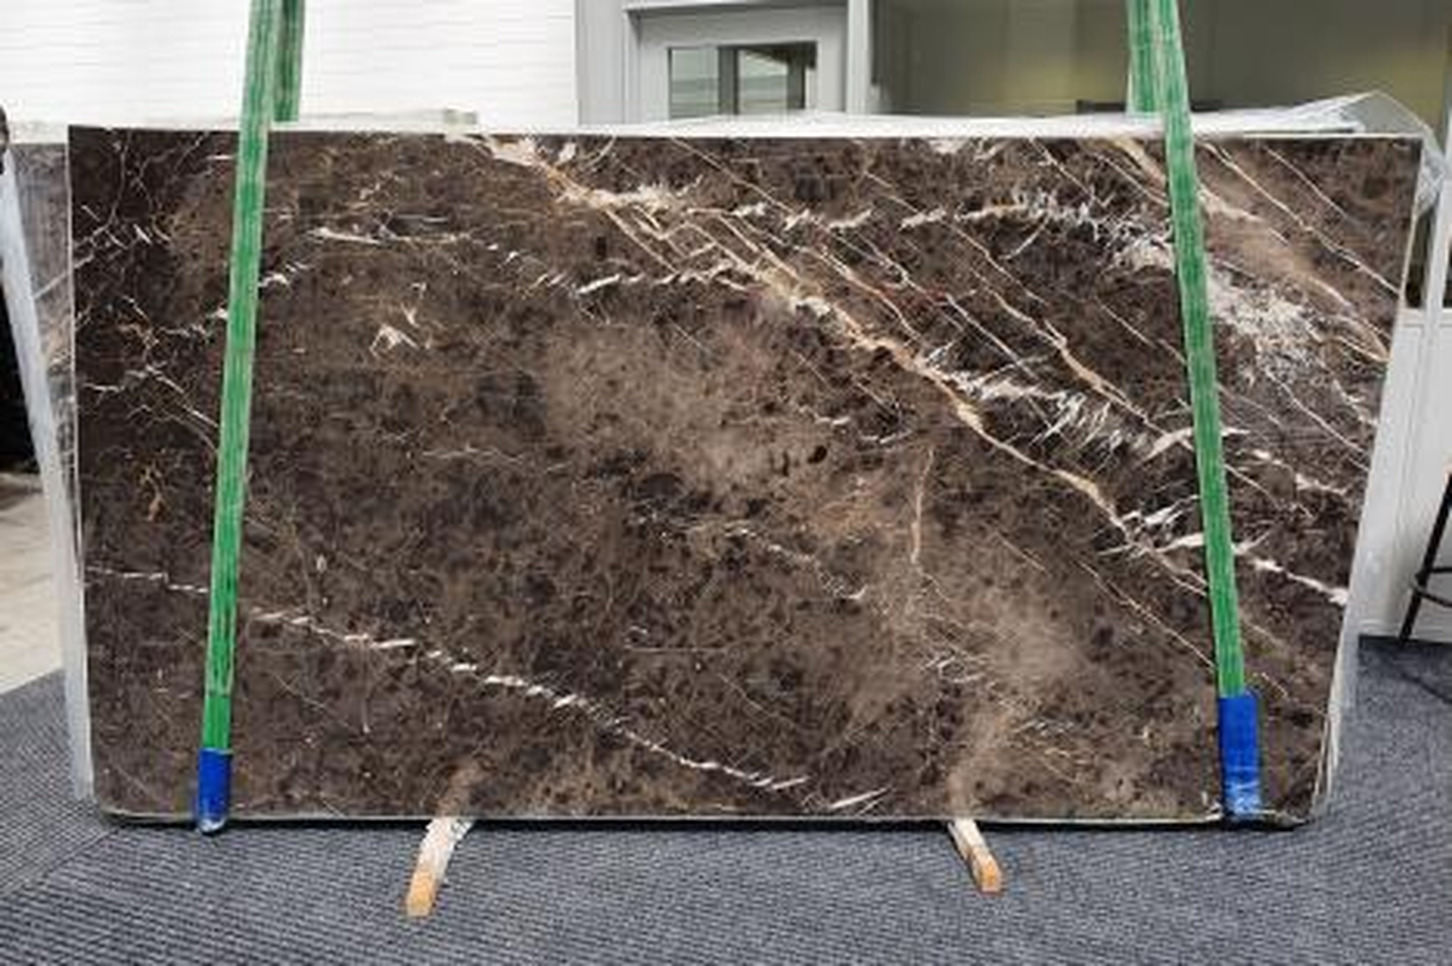 MARRON IRIS Fourniture Veneto (Italie) d' dalles brillantes en marbre naturel 1404 , Slab #10